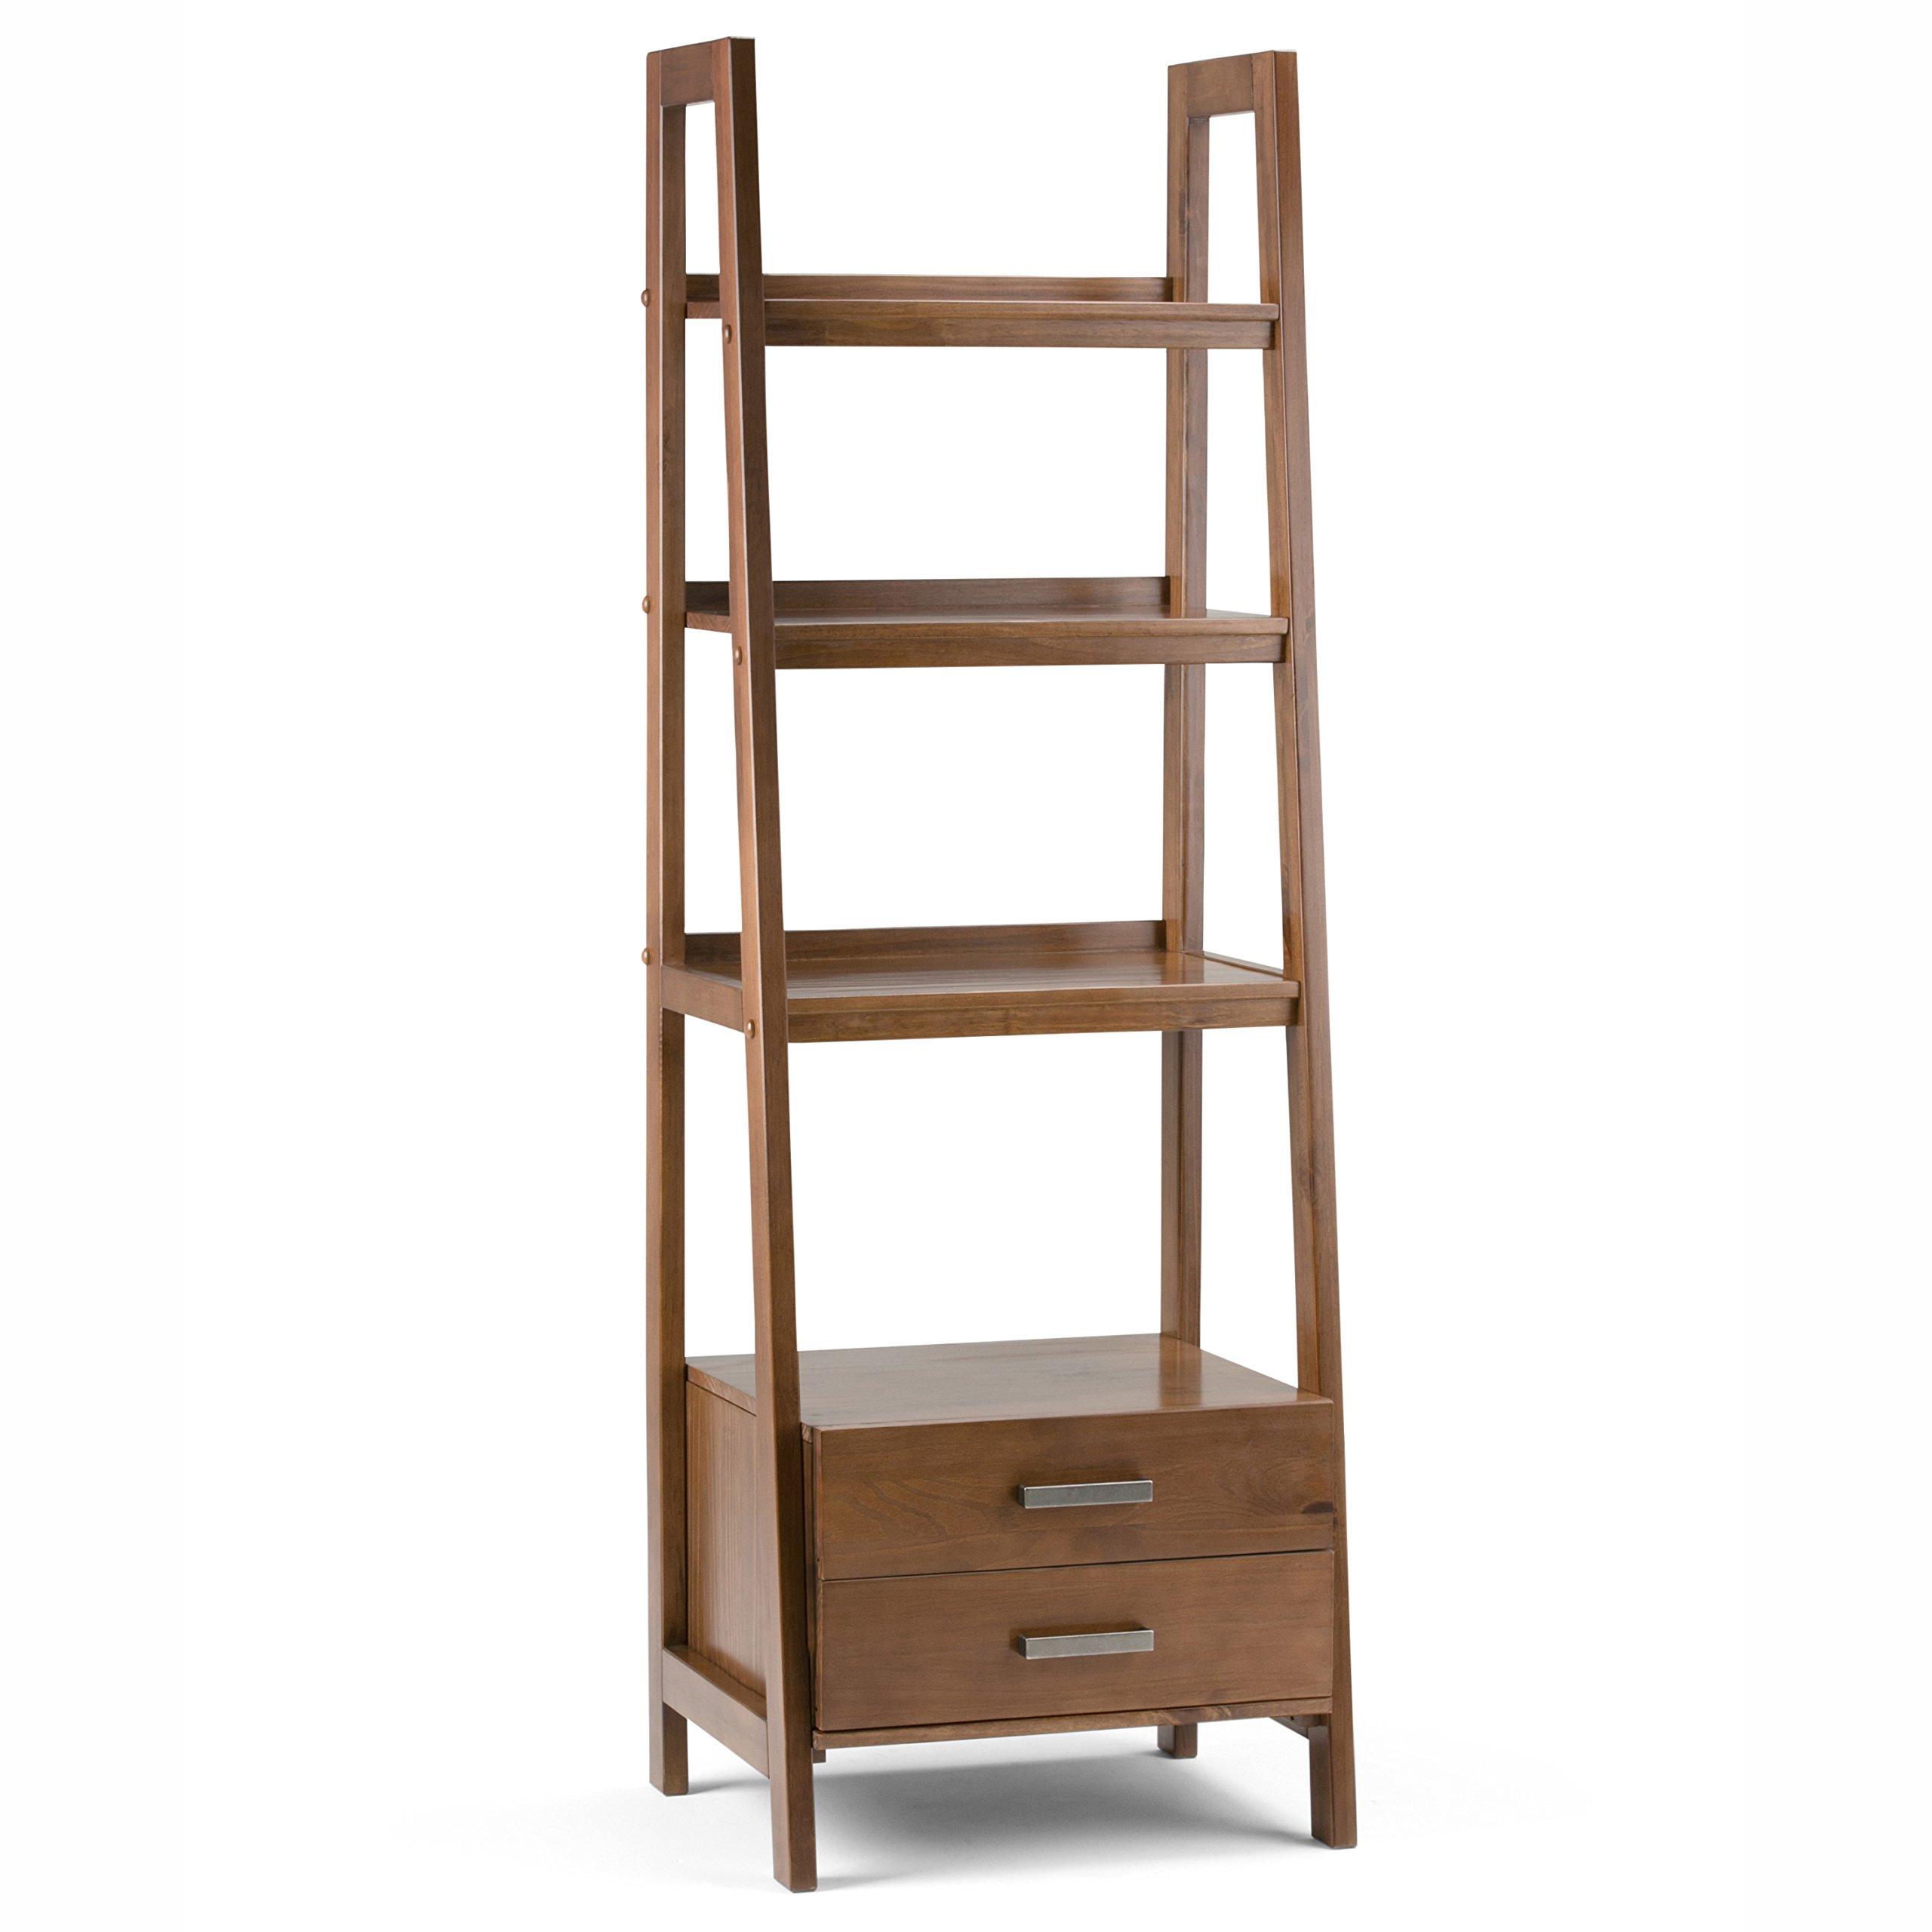 Simpli Home 3AXCSAW-06 Sawhorse Solid Wood 72 inch x 24 inch Modern Industrial Ladder Shelf with Storage in Medium Saddle Brown by Simpli Home